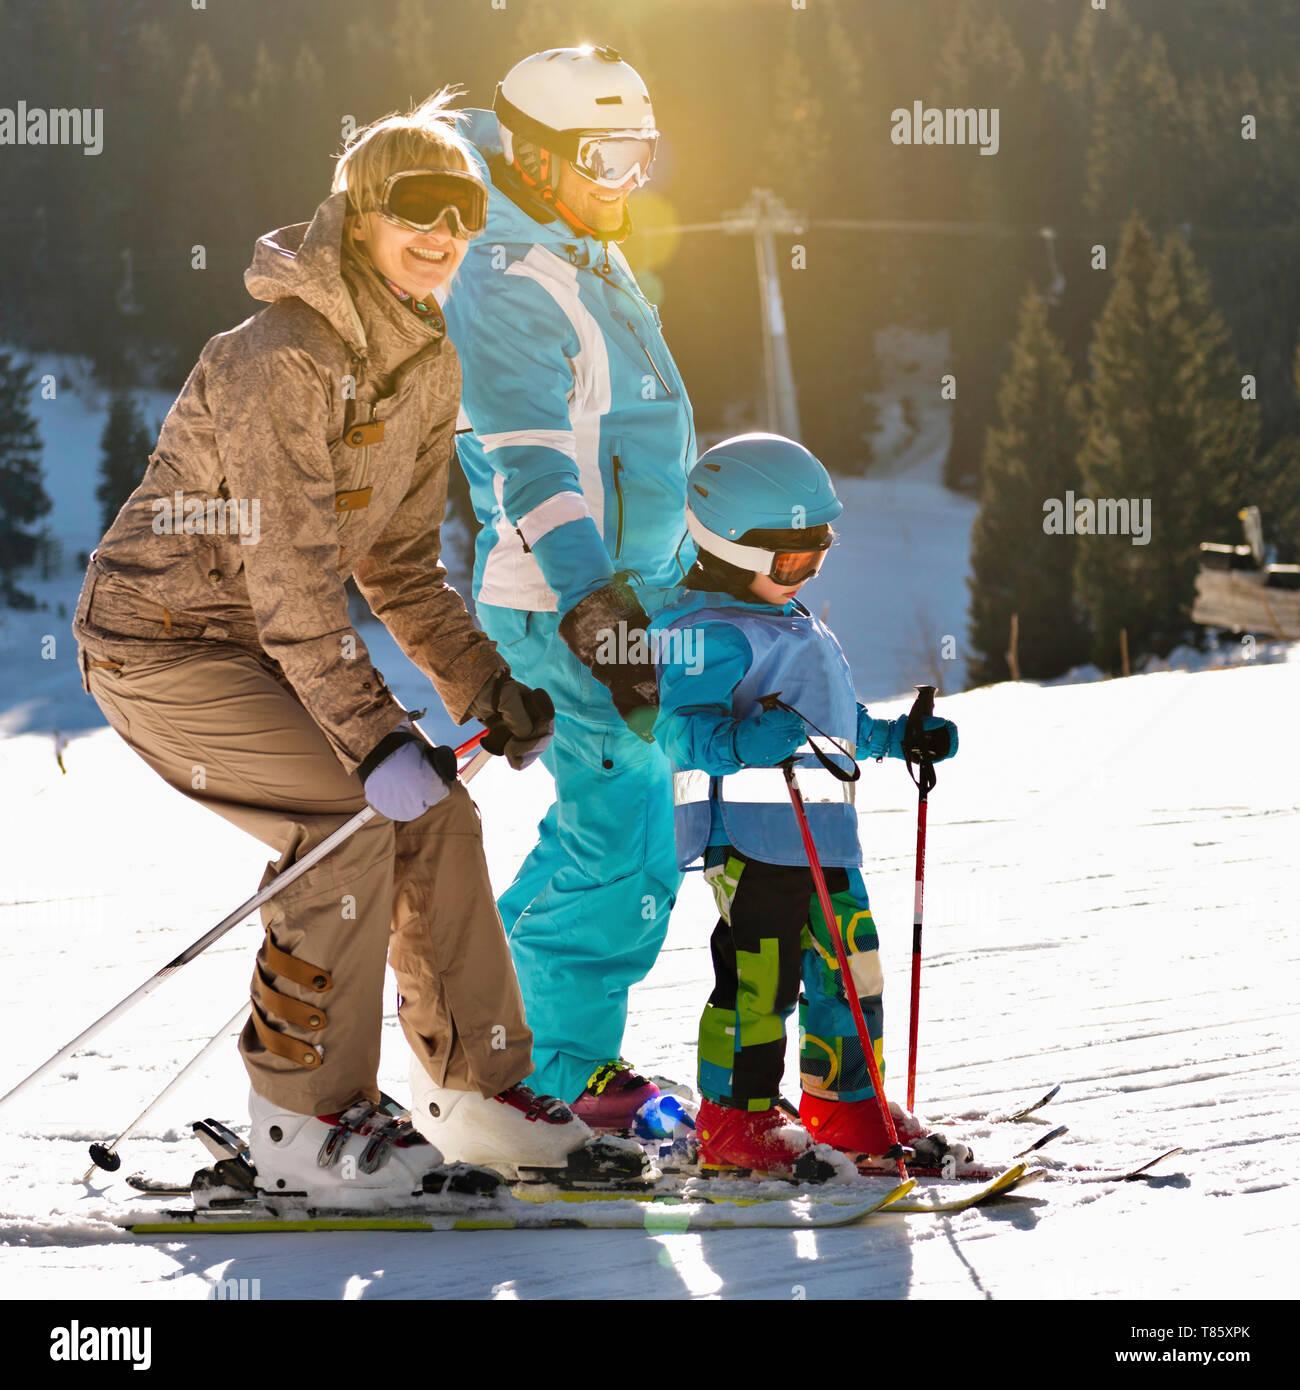 Family on skiing holiday Stock Photo